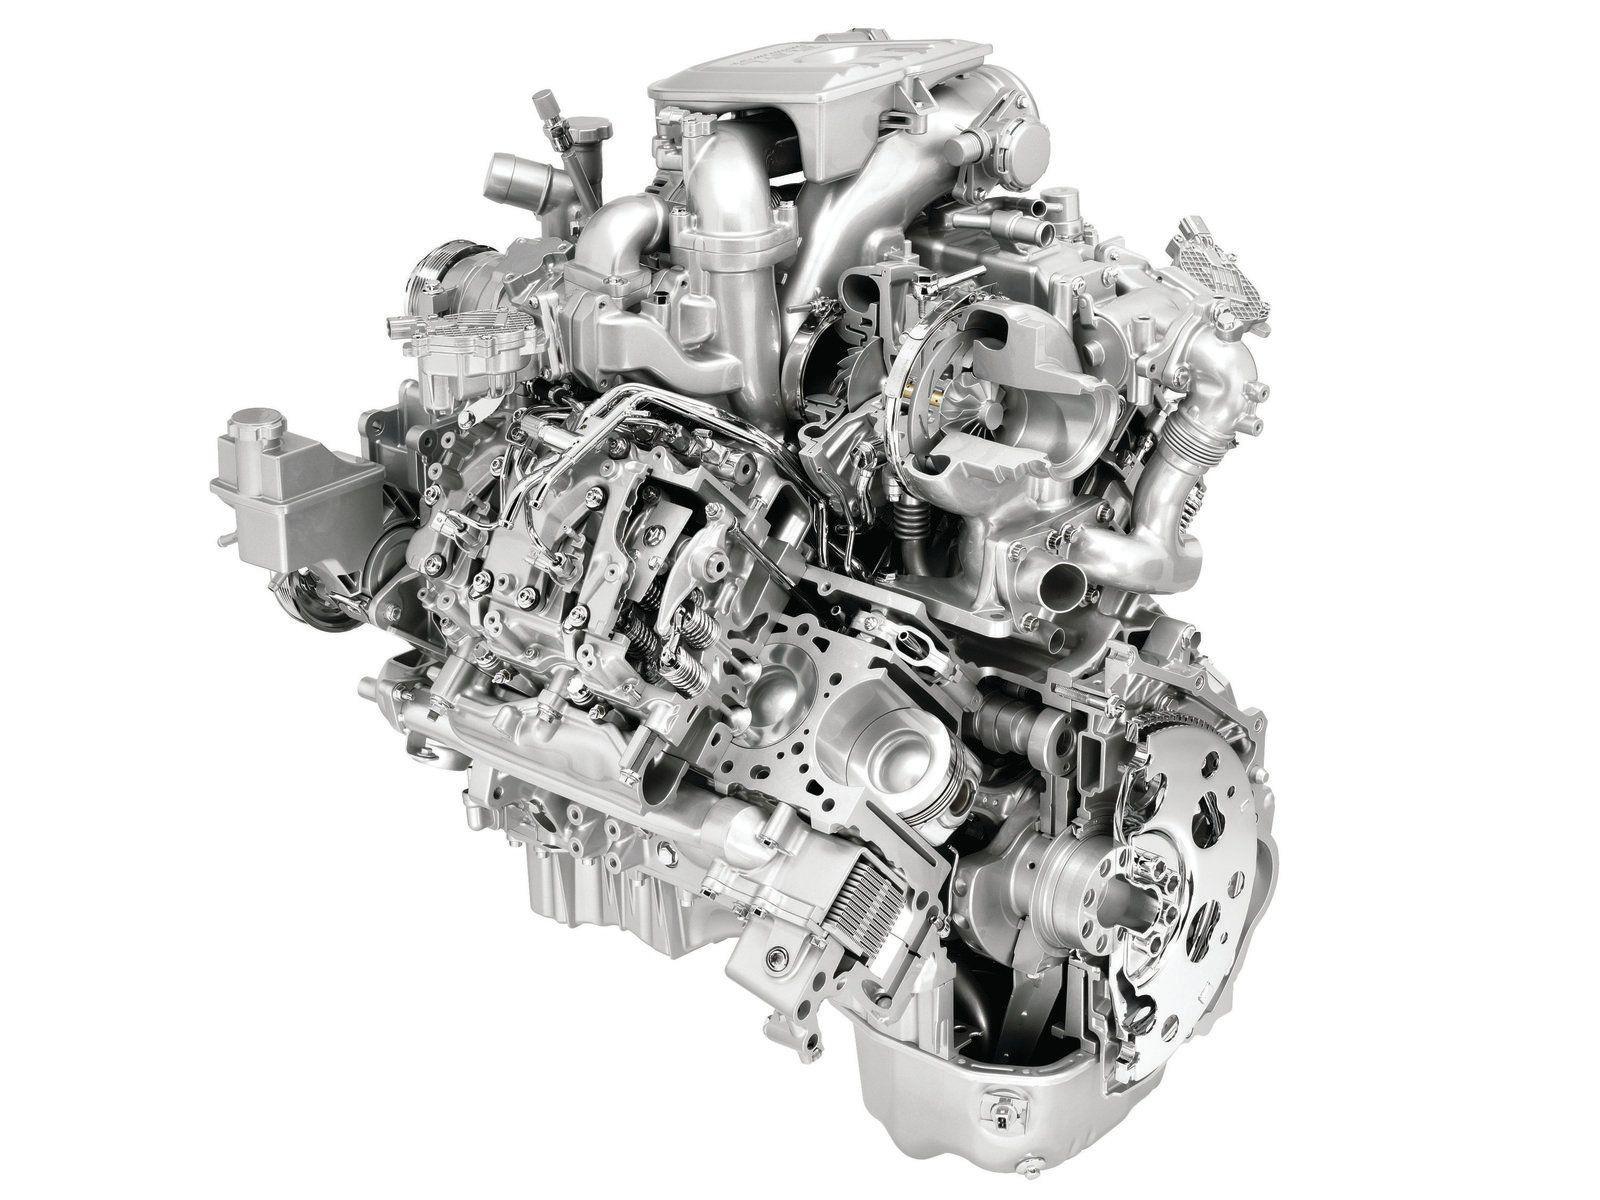 6 6l Duramax Lbz Remanufactured Long Block Reman Long Block Includes New Oem Spec Parts Cam Main Rod Diesel Performance Parts Duramax Diesel Performance